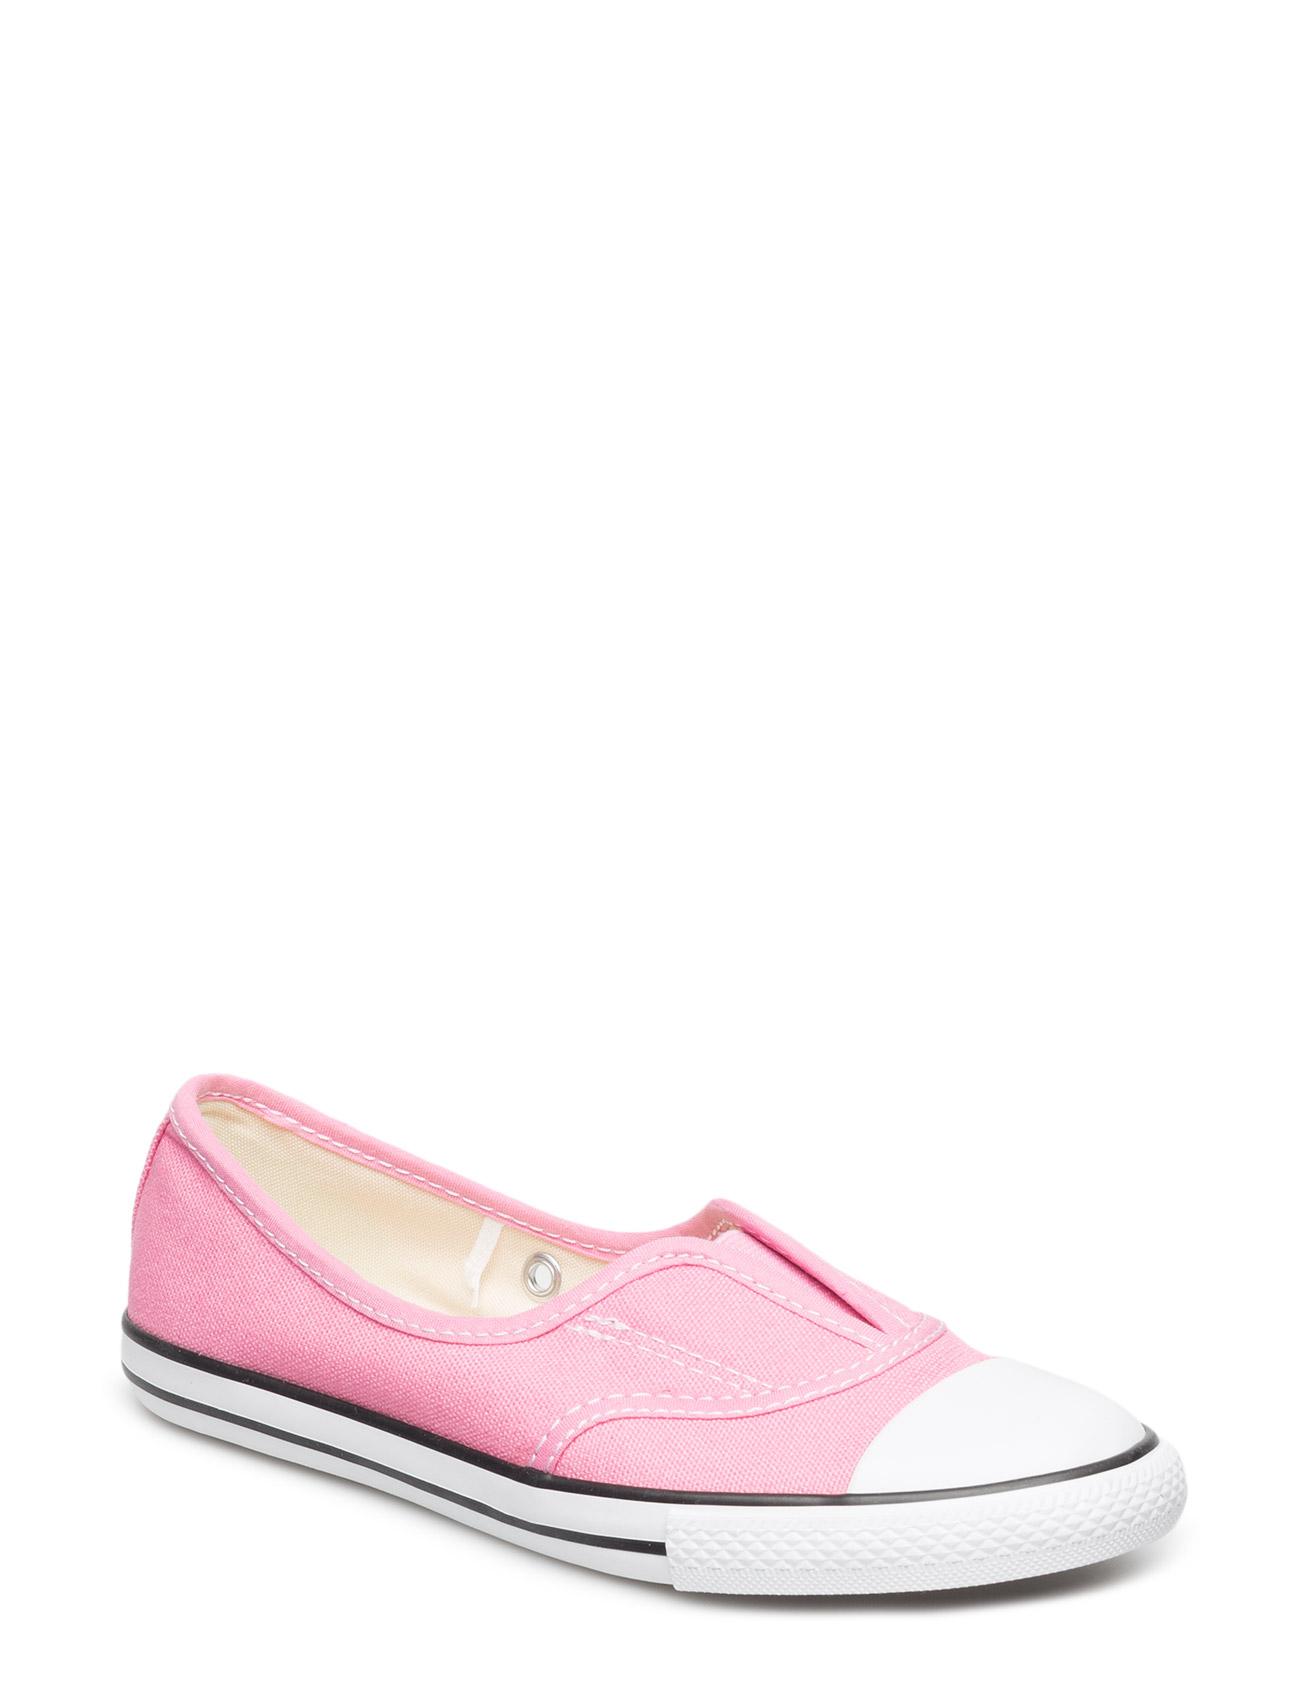 All Star Dainty Cove Converse Sko & Sneakers til Børn i Lyserød